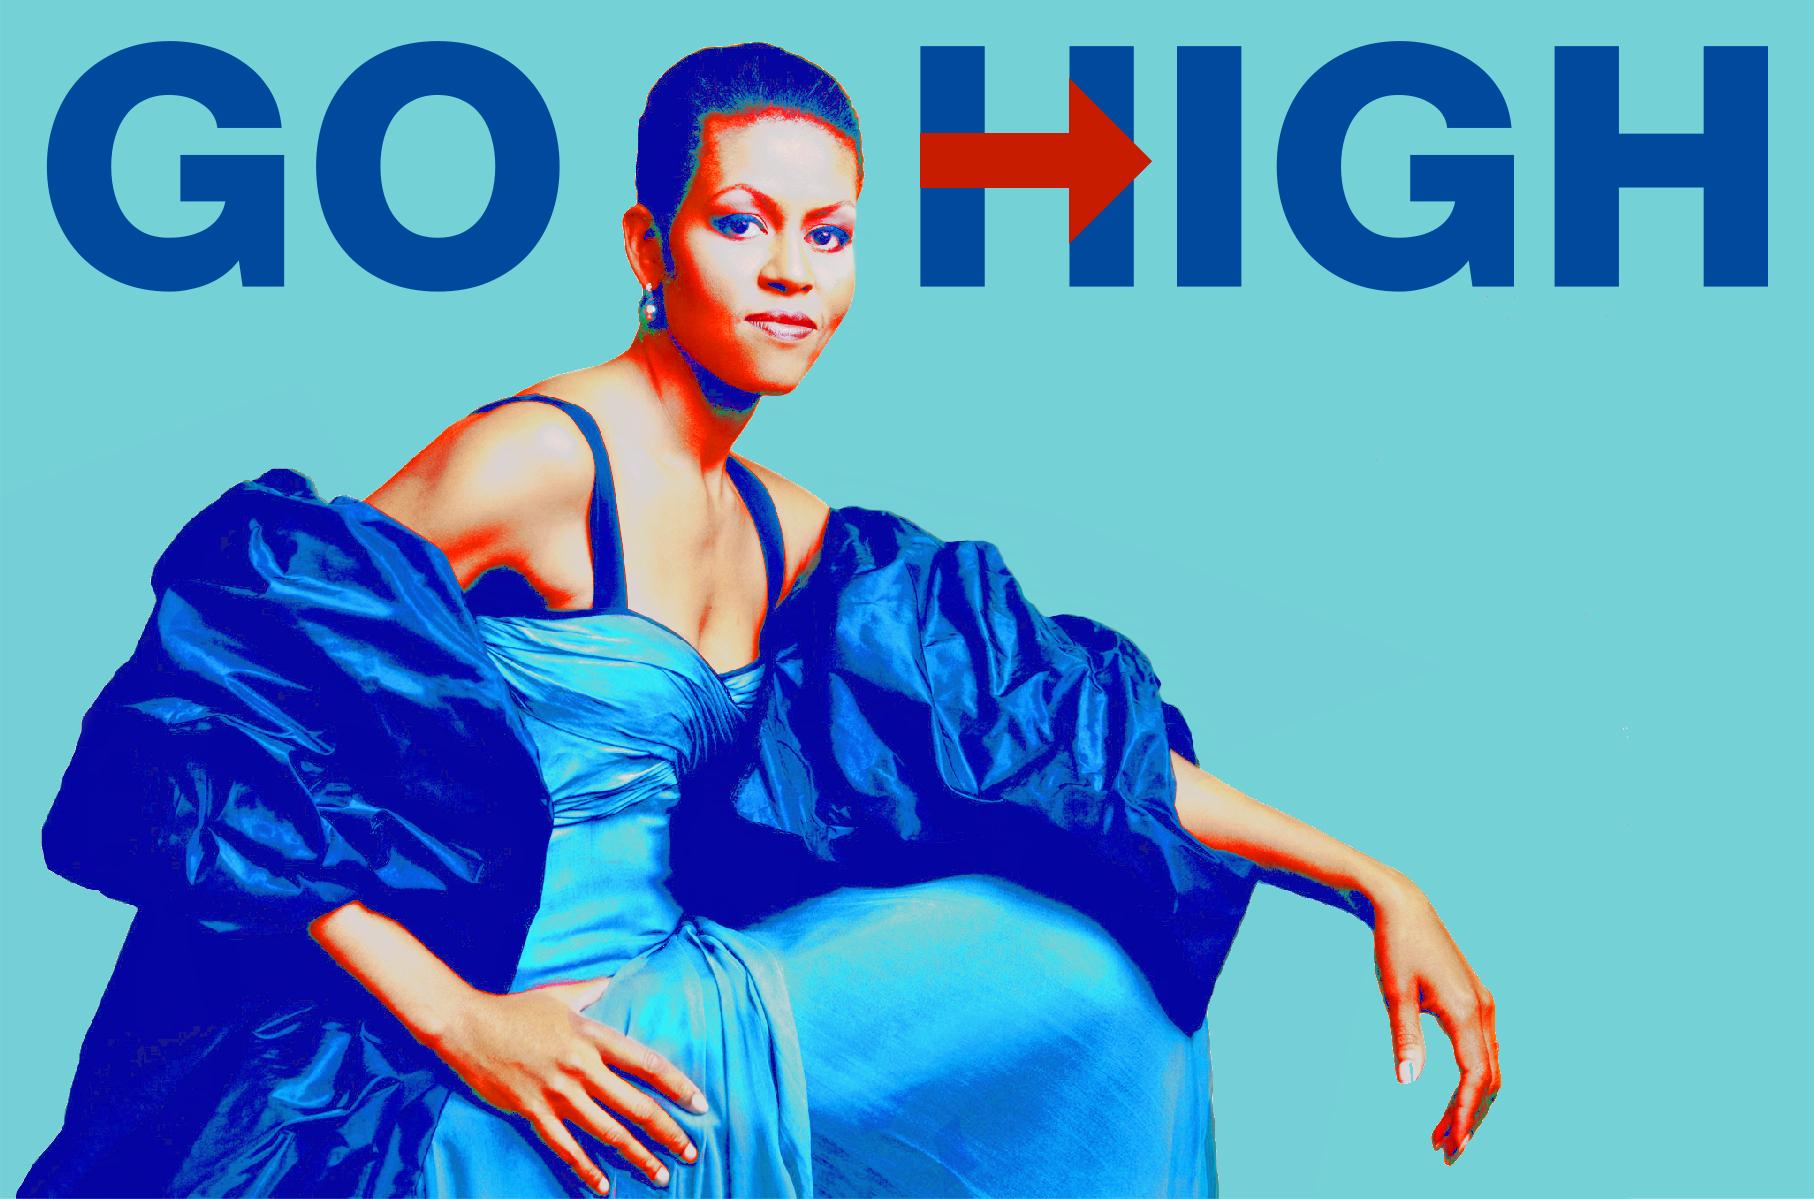 Michelle Poster.jpg